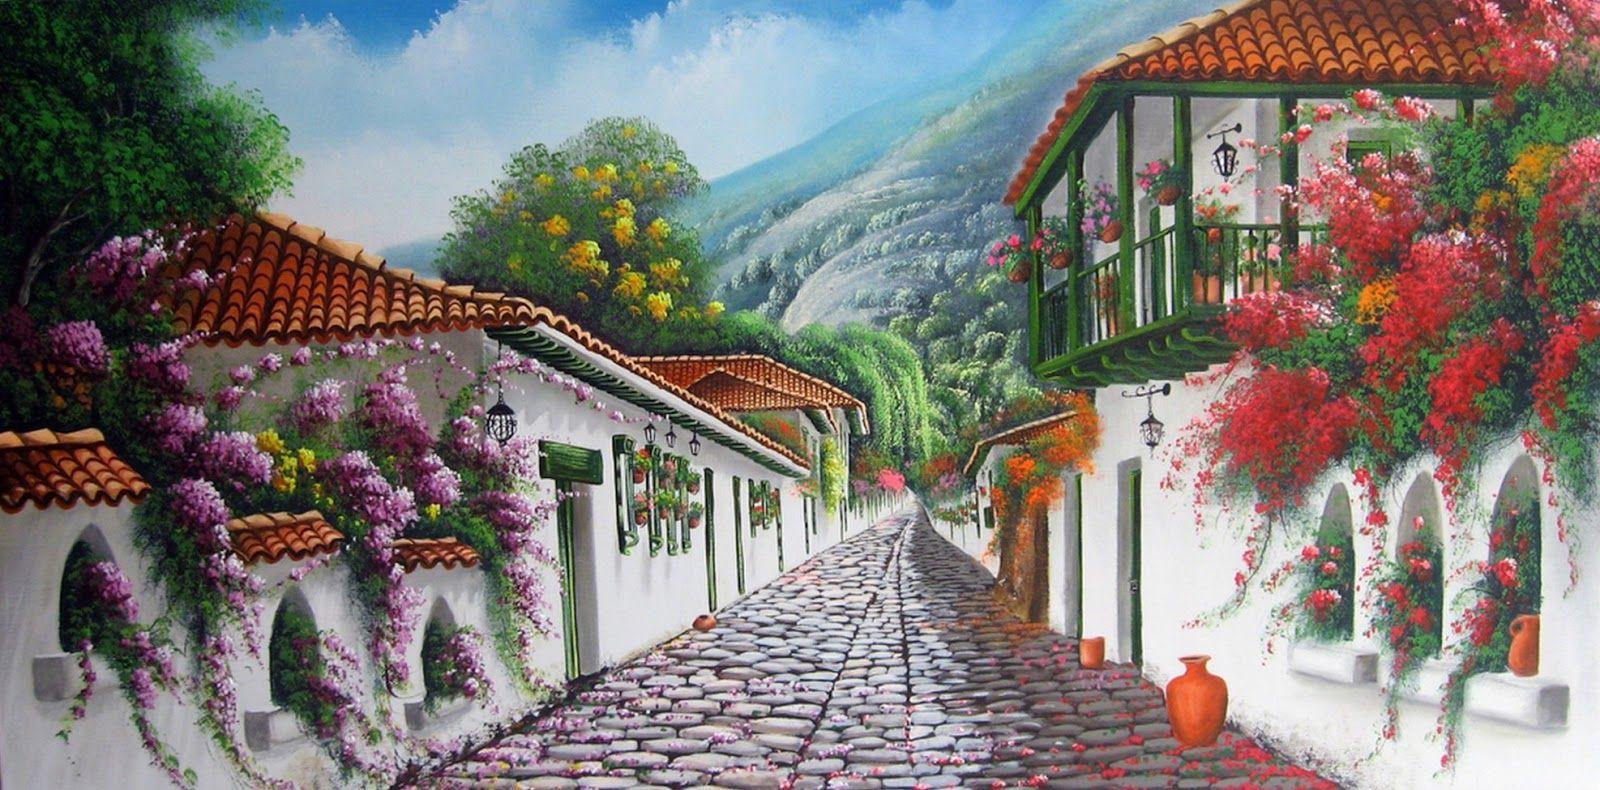 Paisajes y Bodegones en Pintura: José Raúl Rodríguez Galán | arte ...